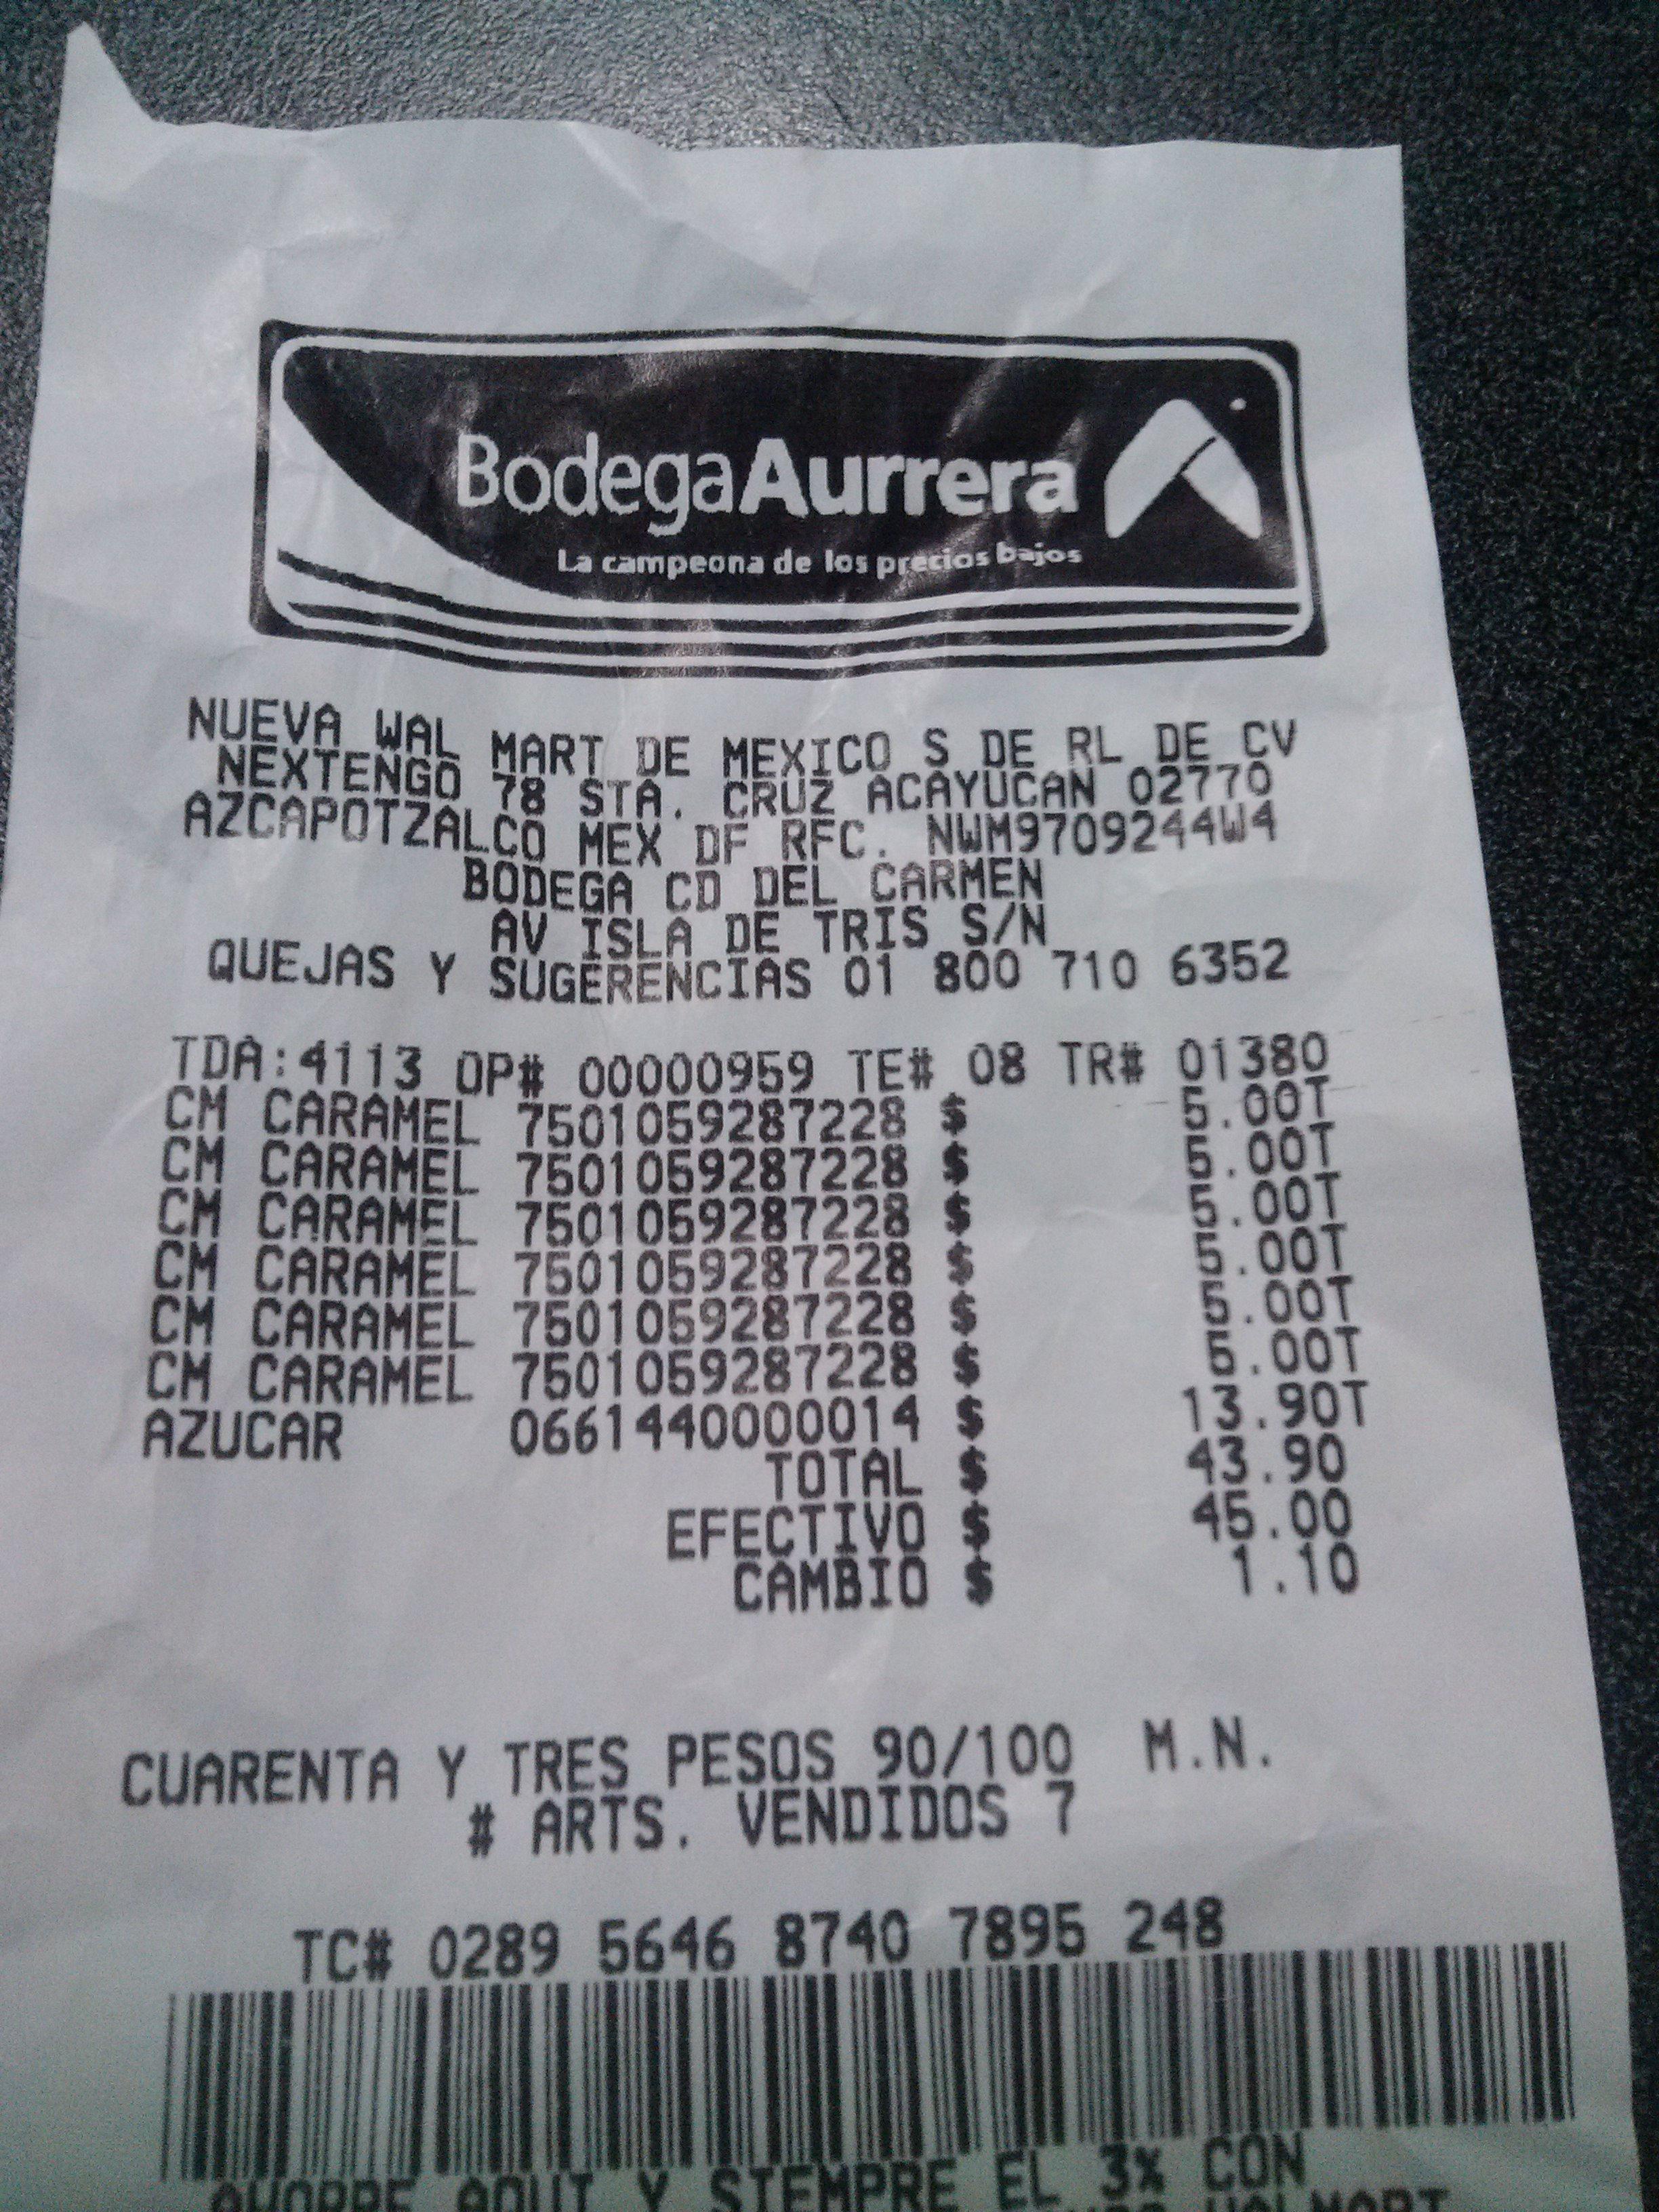 Bodega Aurrerá: COFFEE MATE CARAMELO $5.00